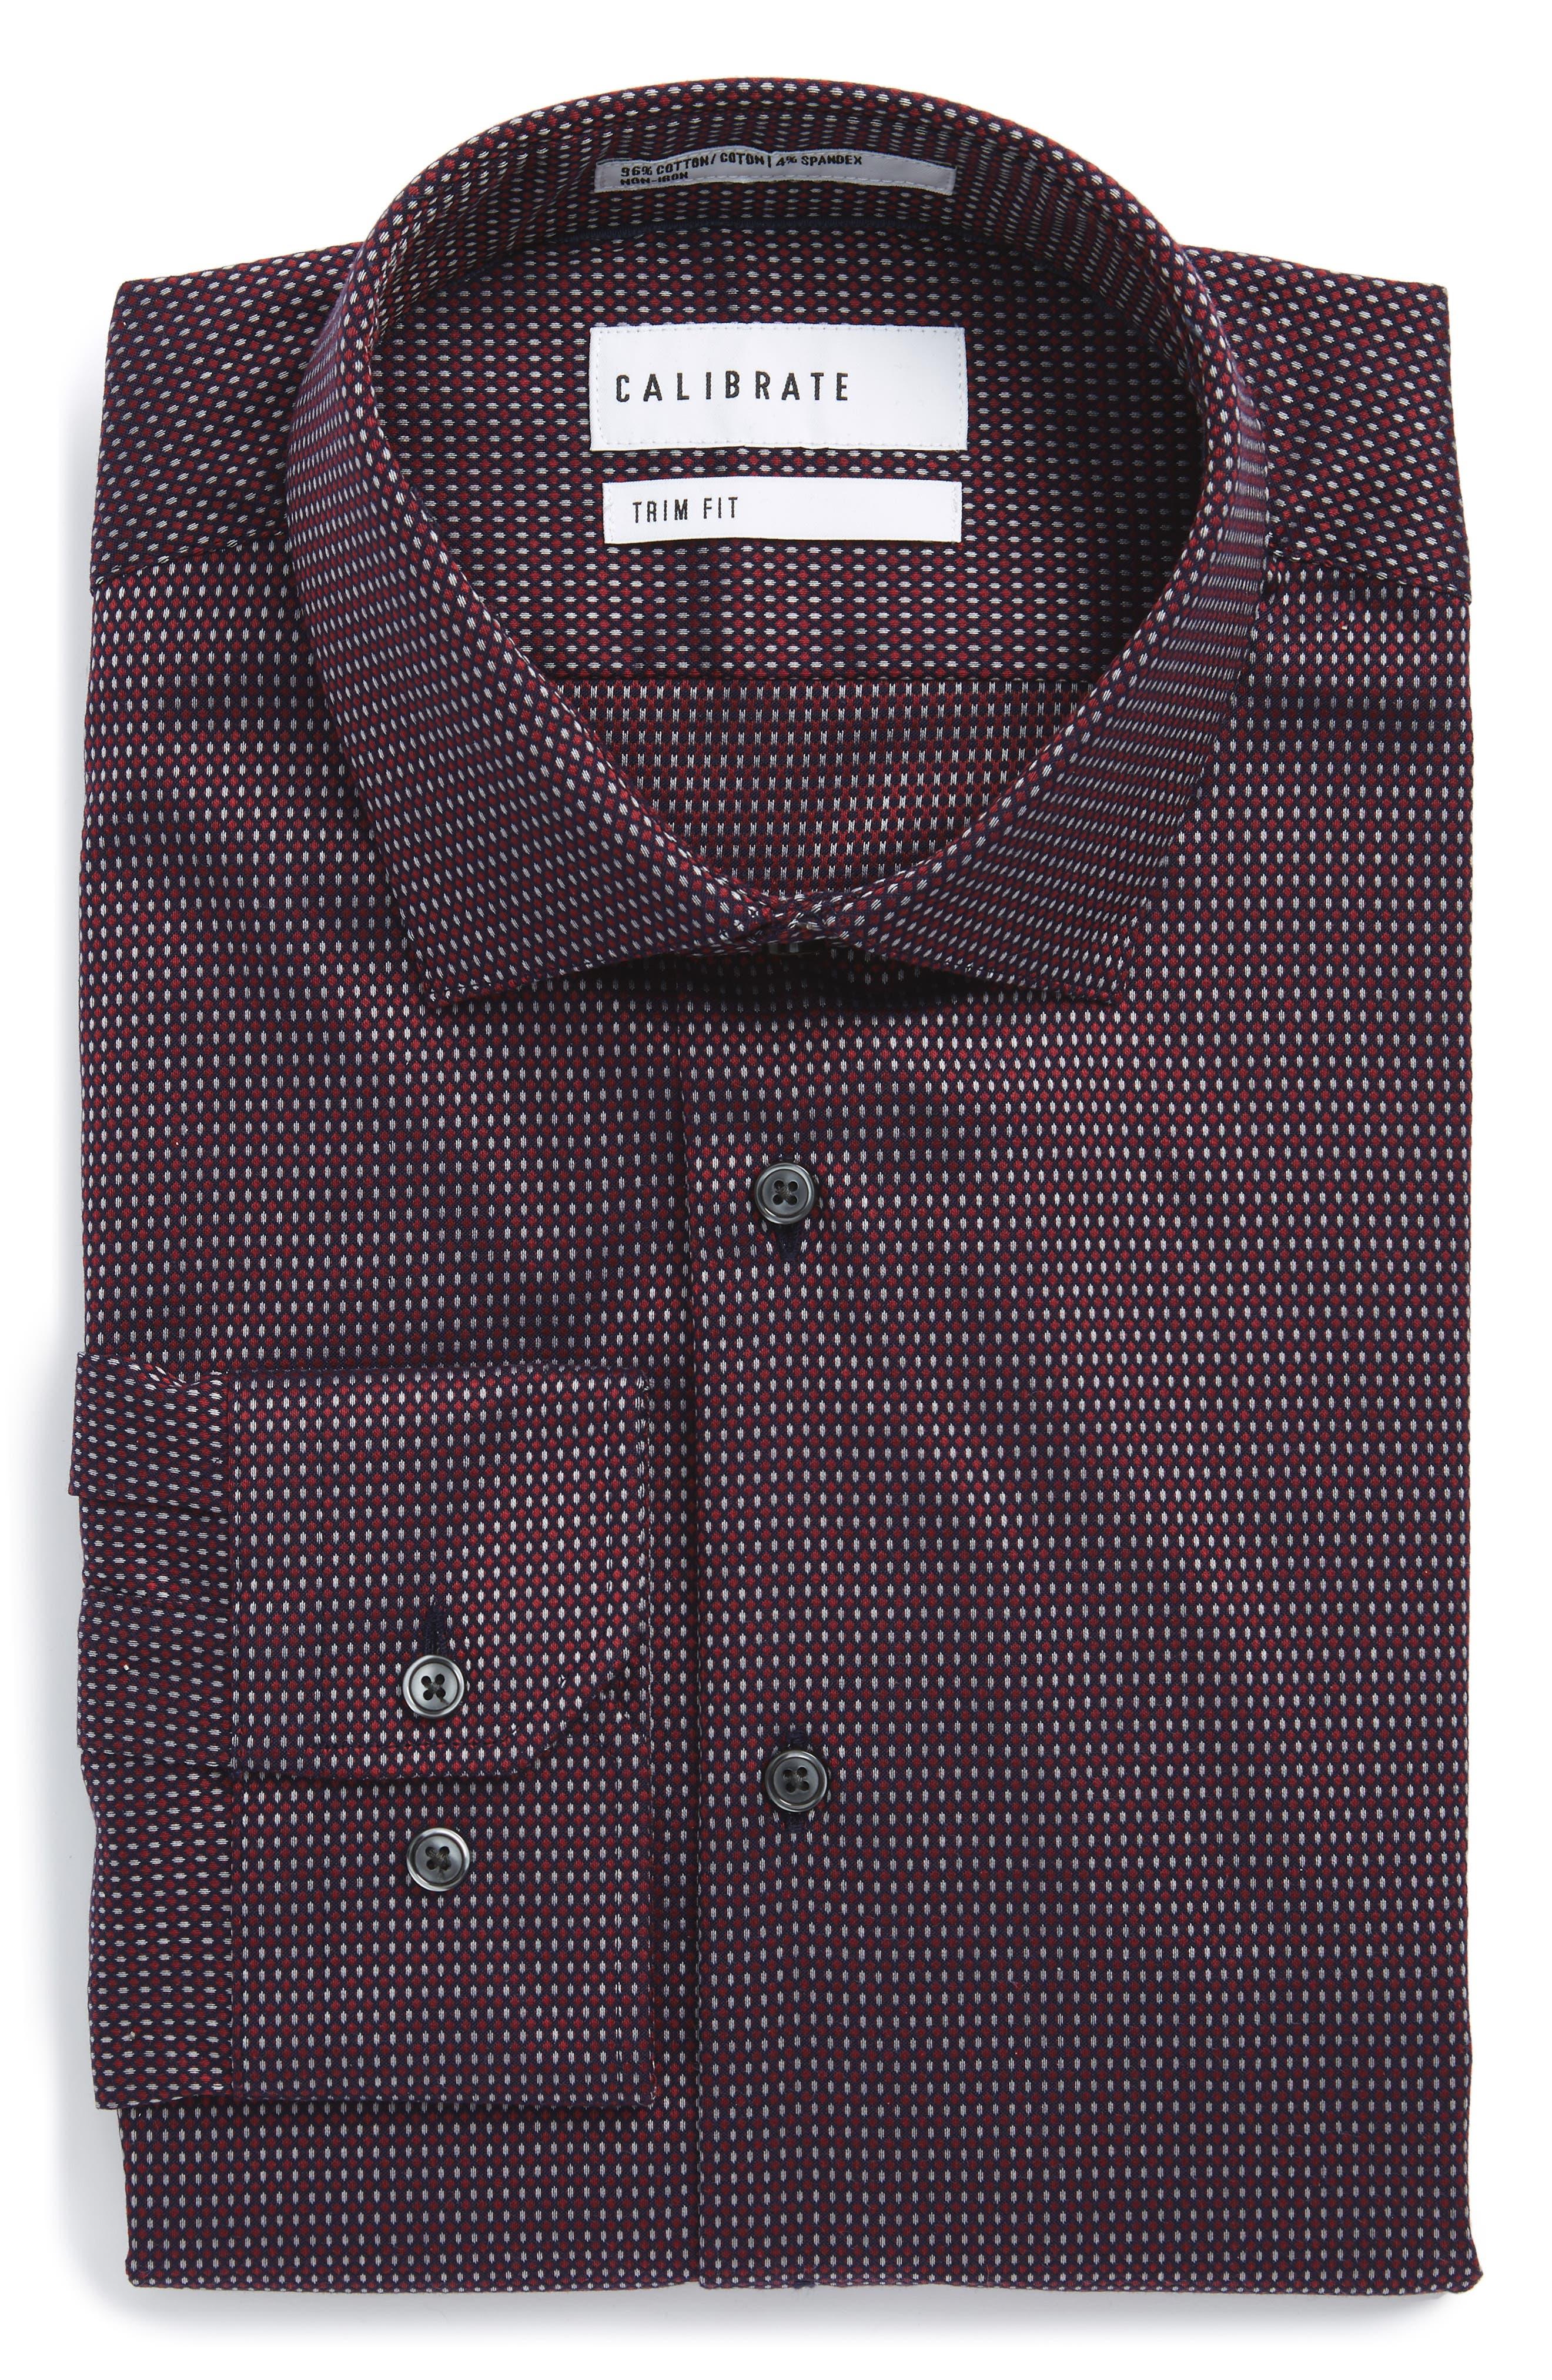 Calibrate Trim Fit Non-Iron Stretch Dot Dress Shirt